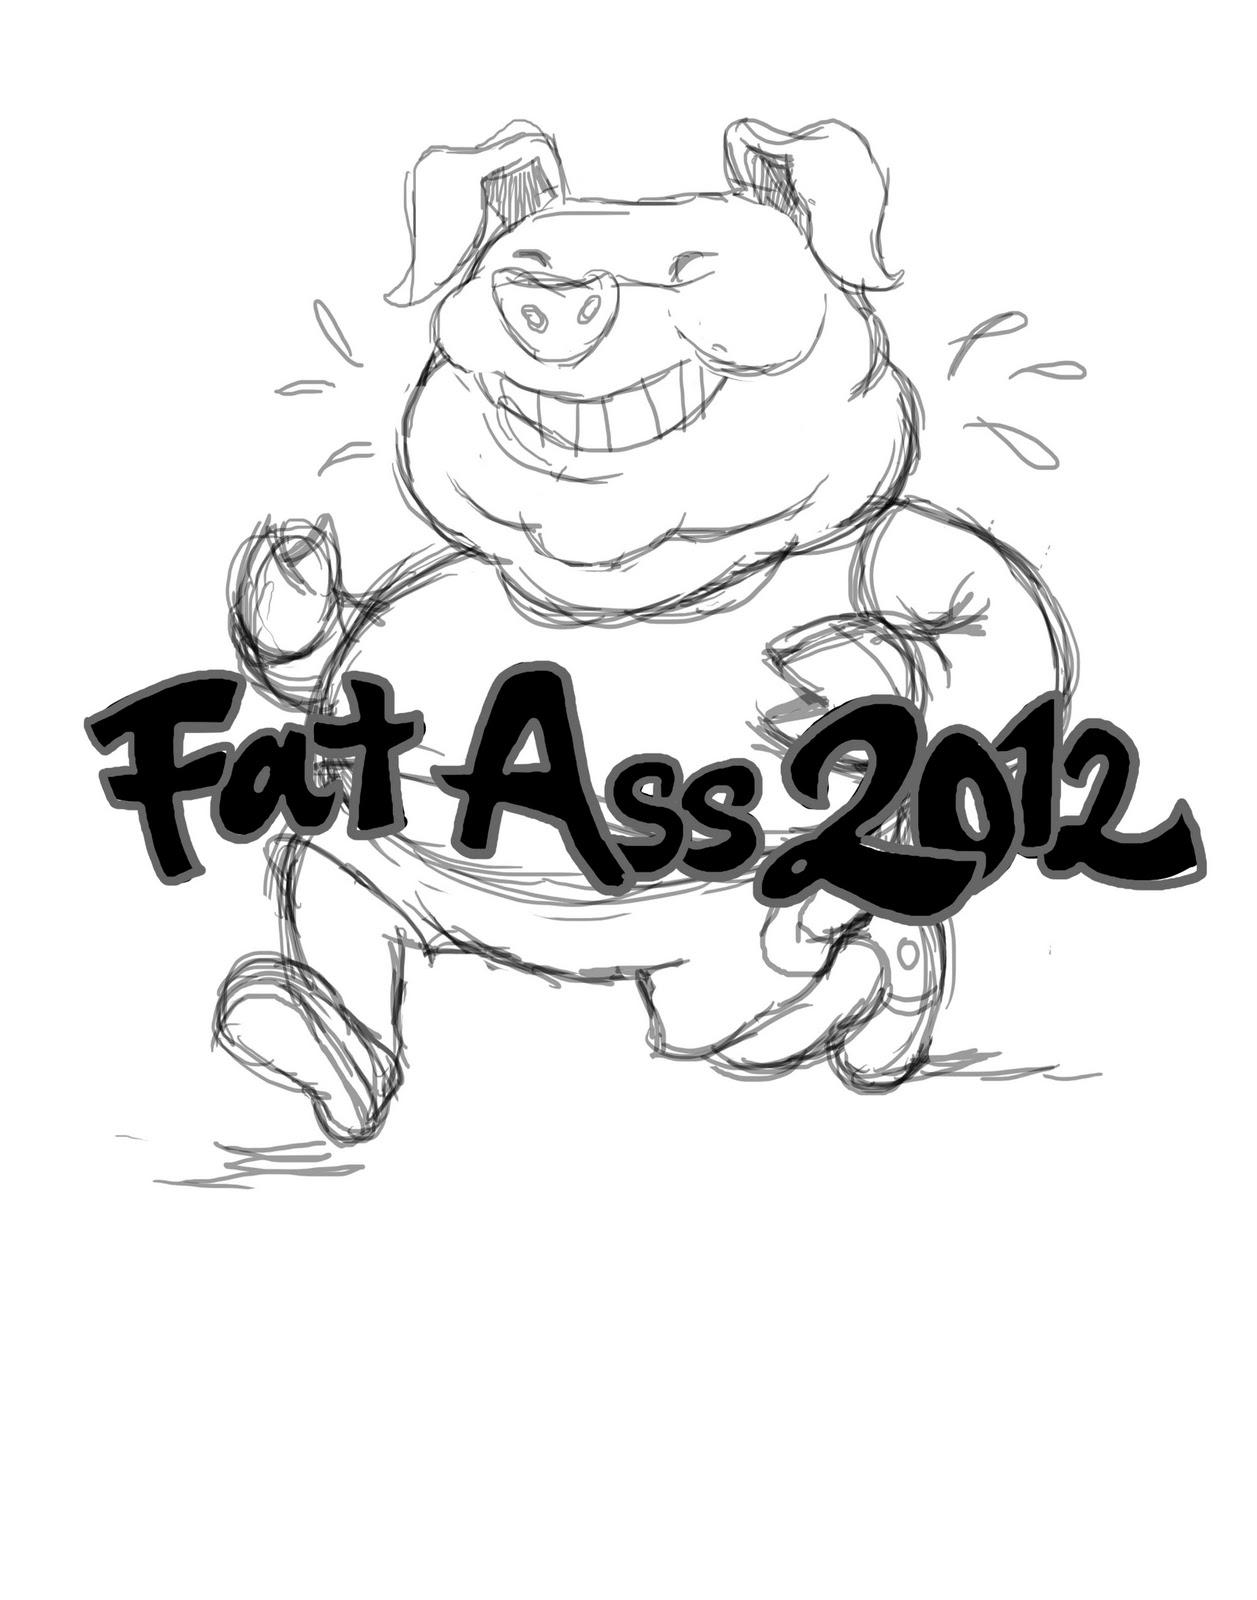 Ultrarunning And Beyond 2012 Fat Ass List Guidelines